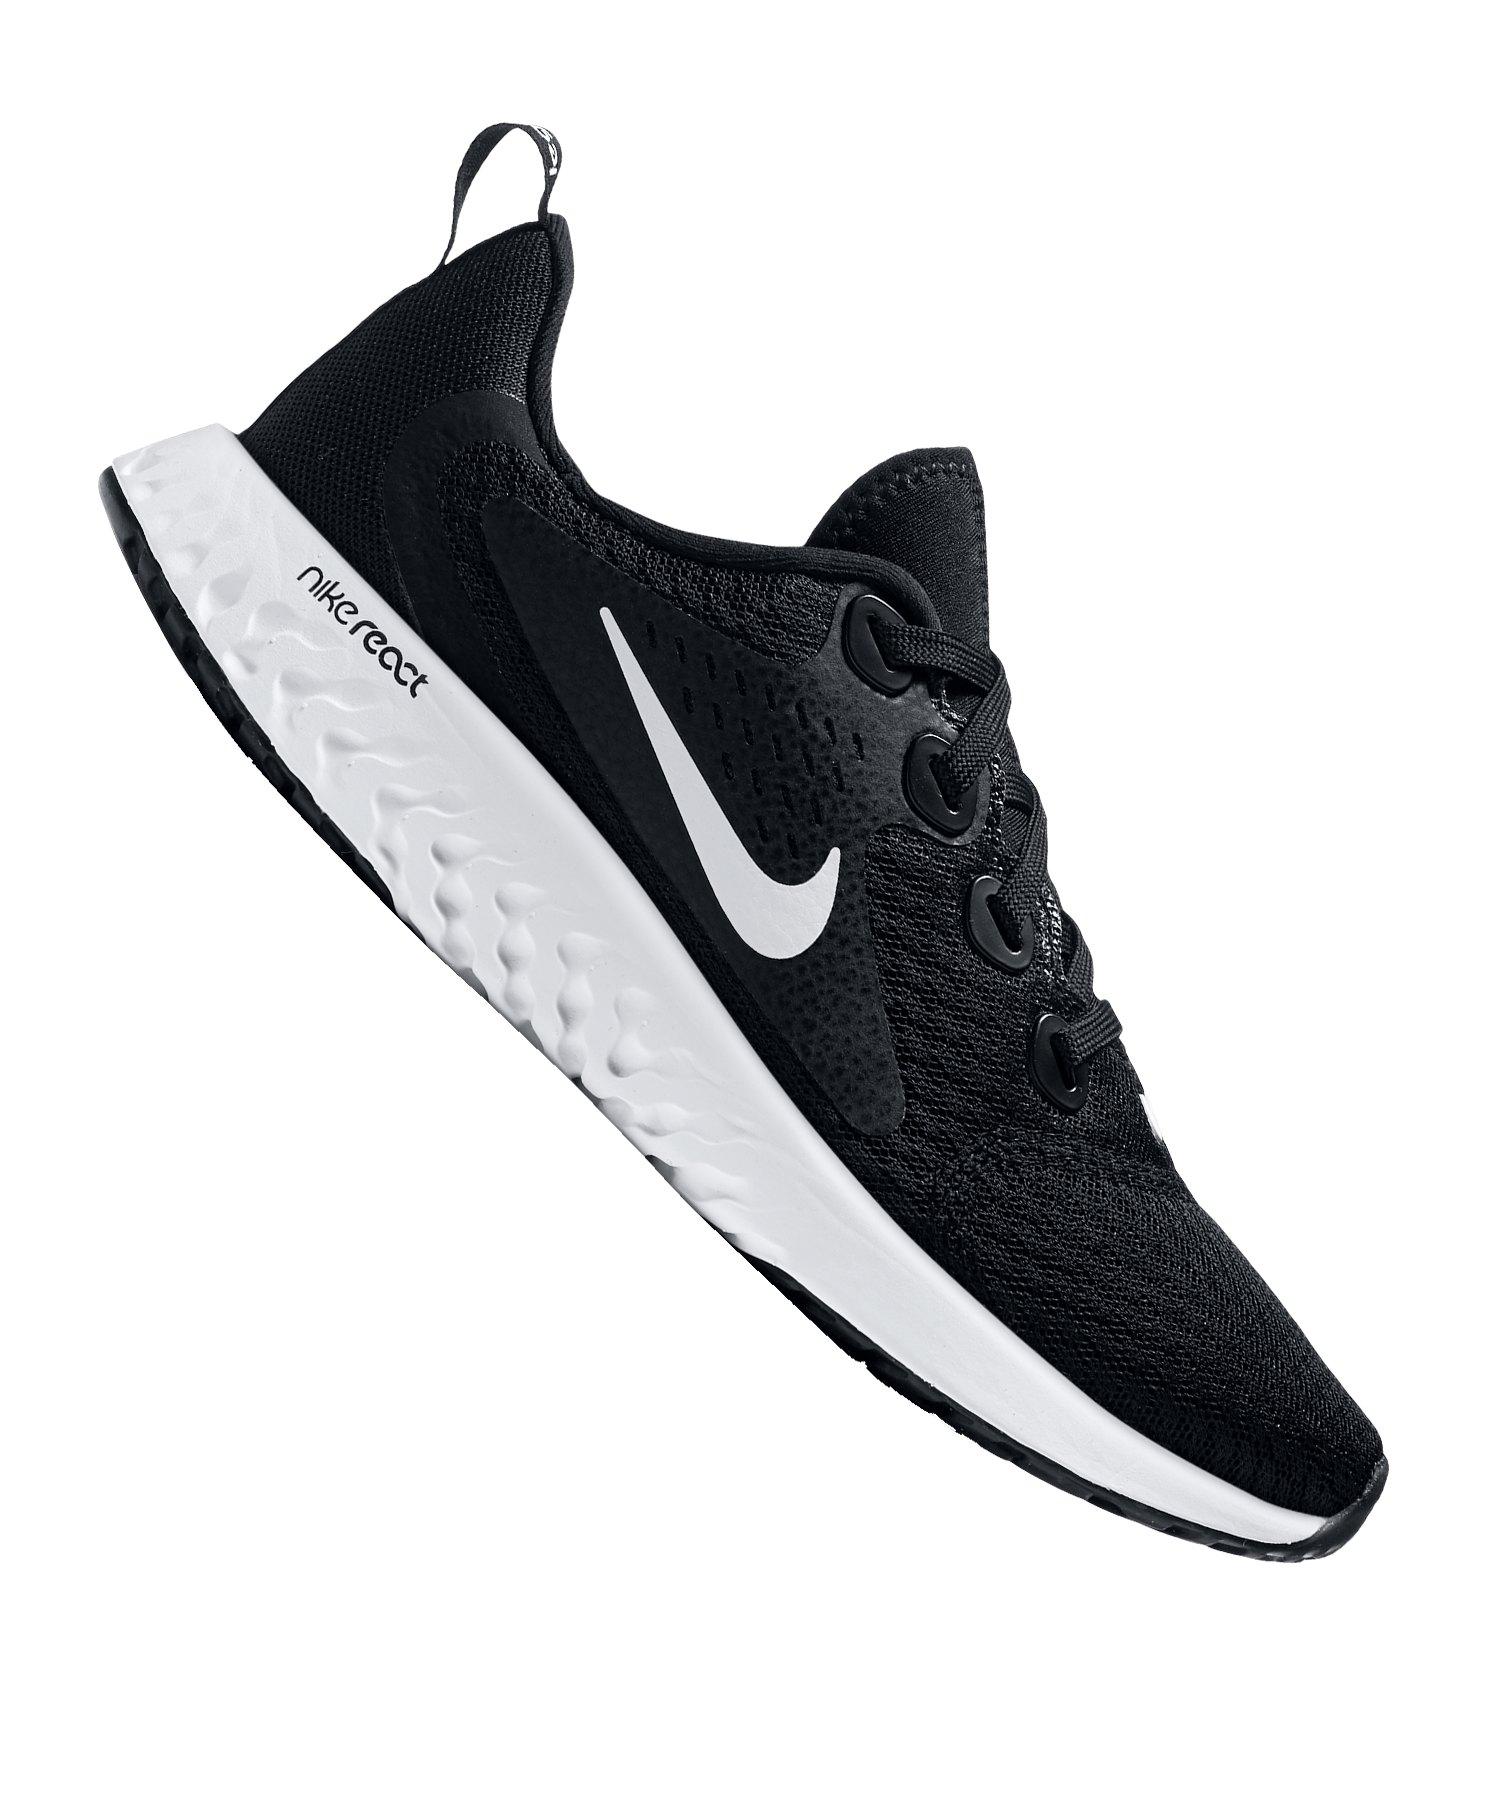 competitive price 53073 b79d7 Nike Legend React Running Kids Schwarz Weiss F001 - schwarz